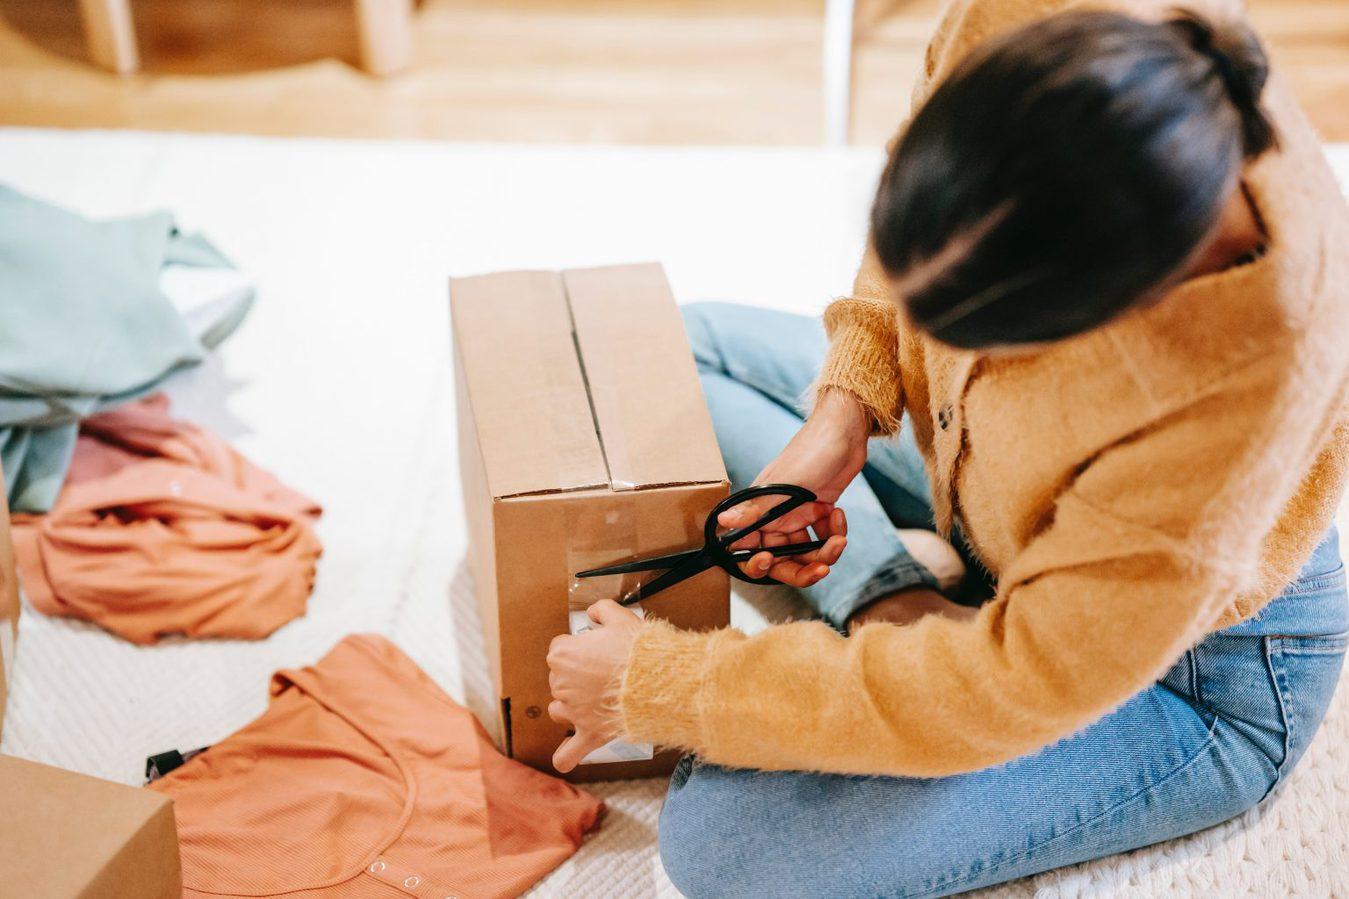 side shot of woman taping up cardboard box